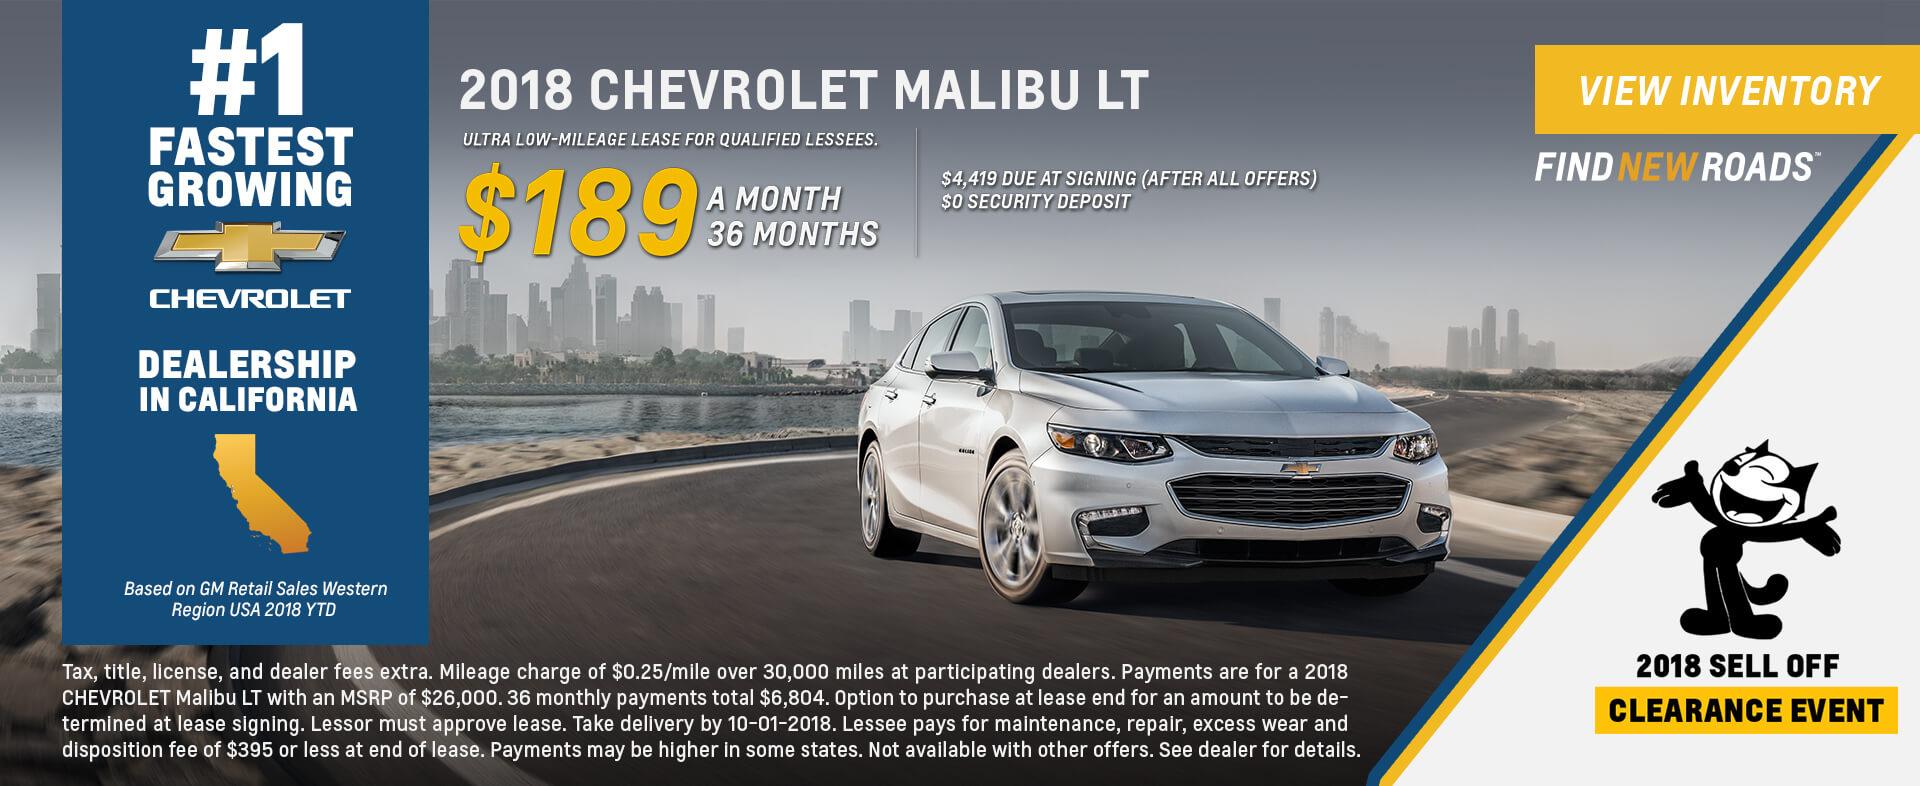 Chevrolet Malibu $189 Lease